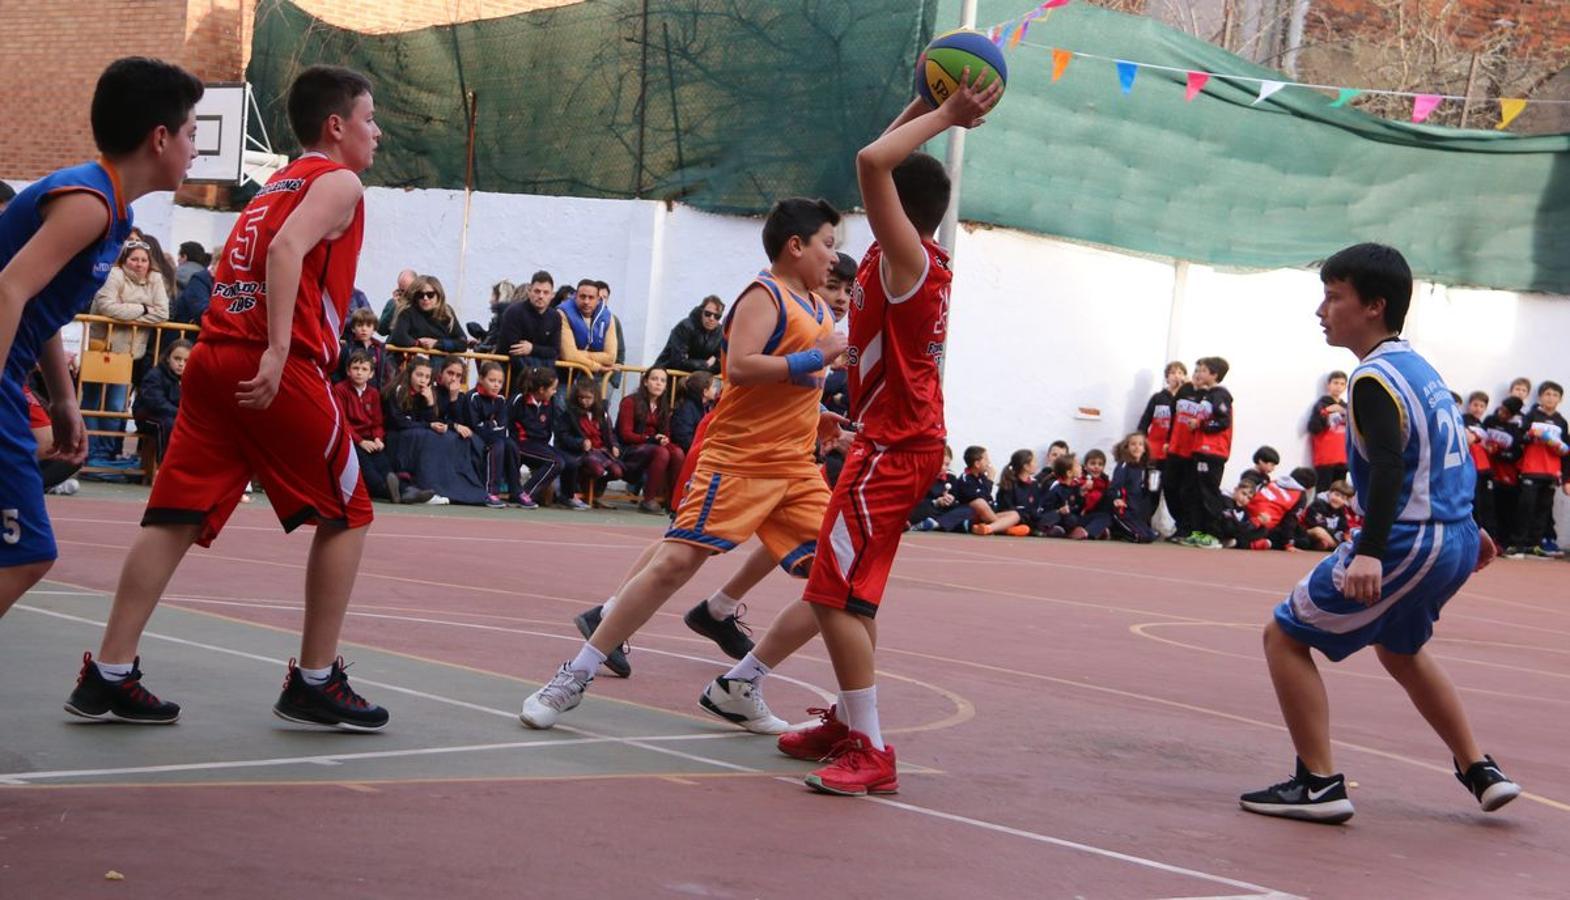 La final del Torneo de Minibasket del Colegio Leonés